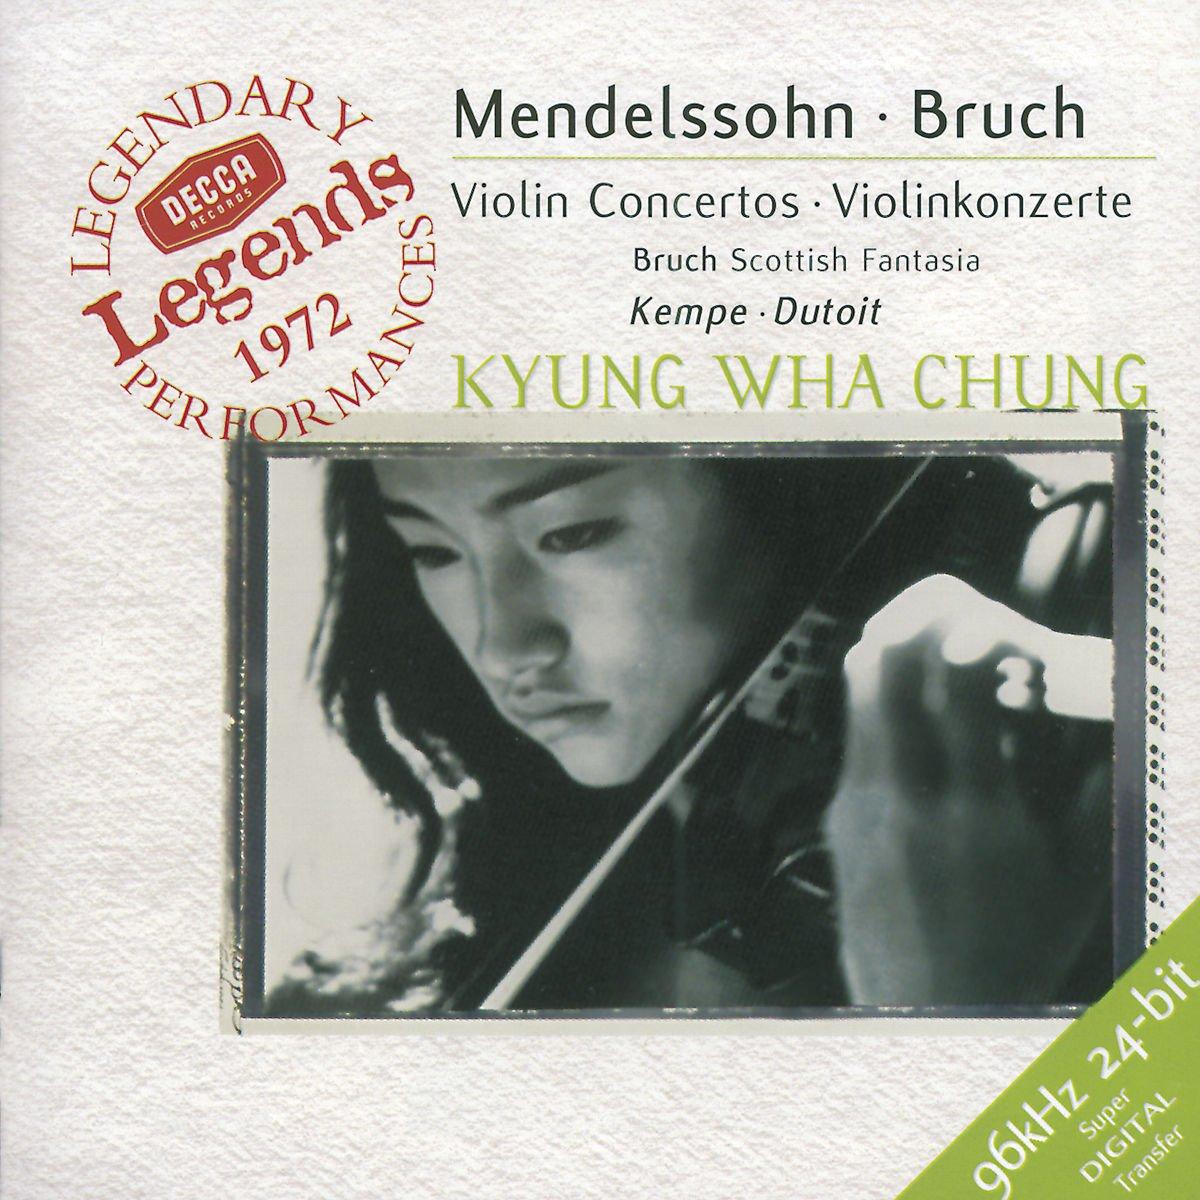 Kyung Wha Chung. Mendelssohn: Violin Concerto / Bruch: Violin Conce цена